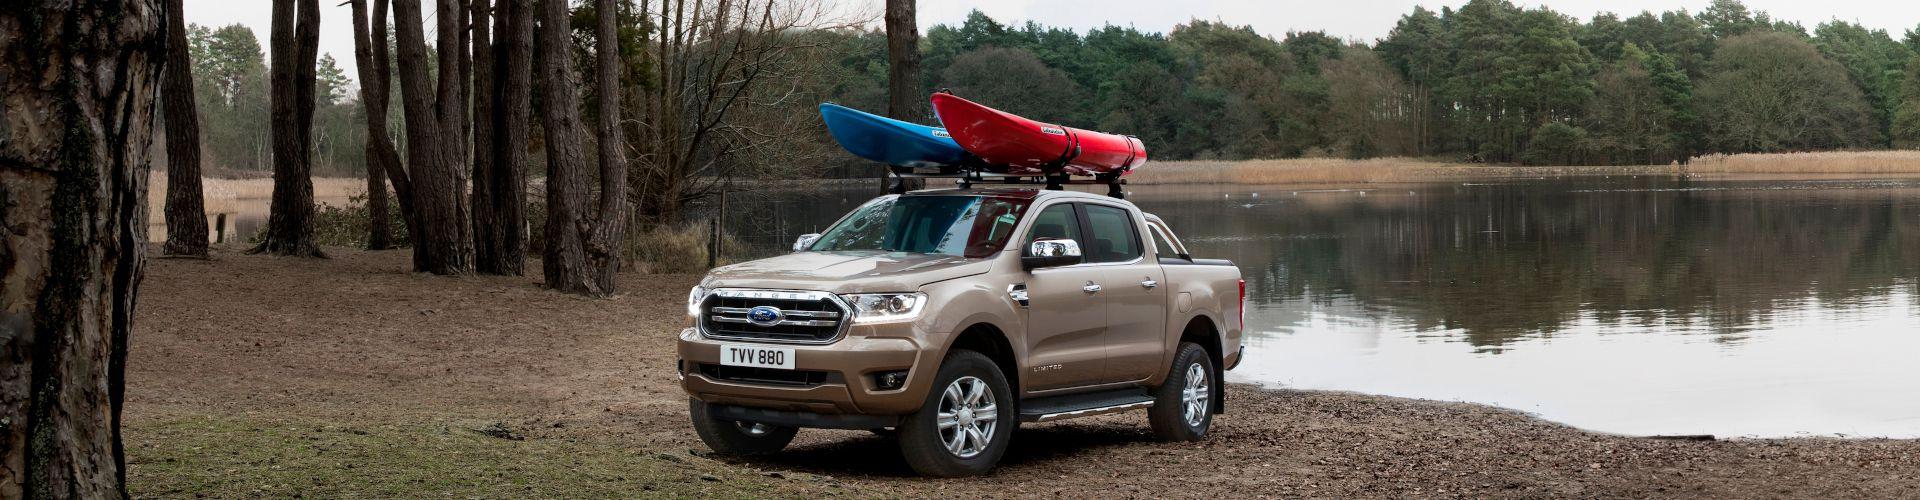 Ford Ranger Limited - Α. Λιάπης Αντιπροσωπεία